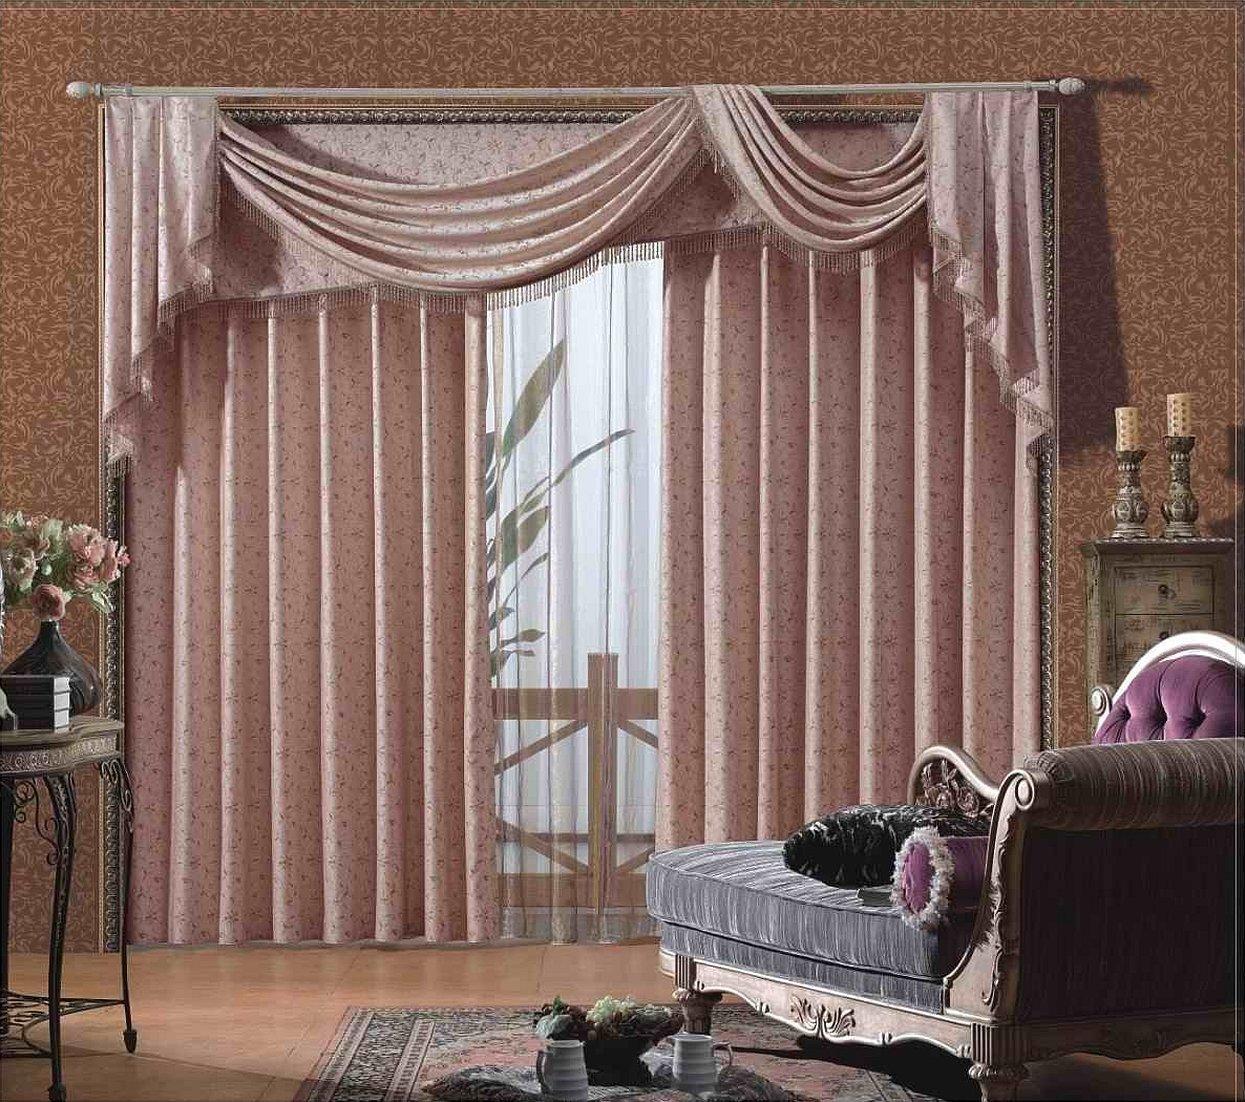 Занавески в зал в классическом стиле